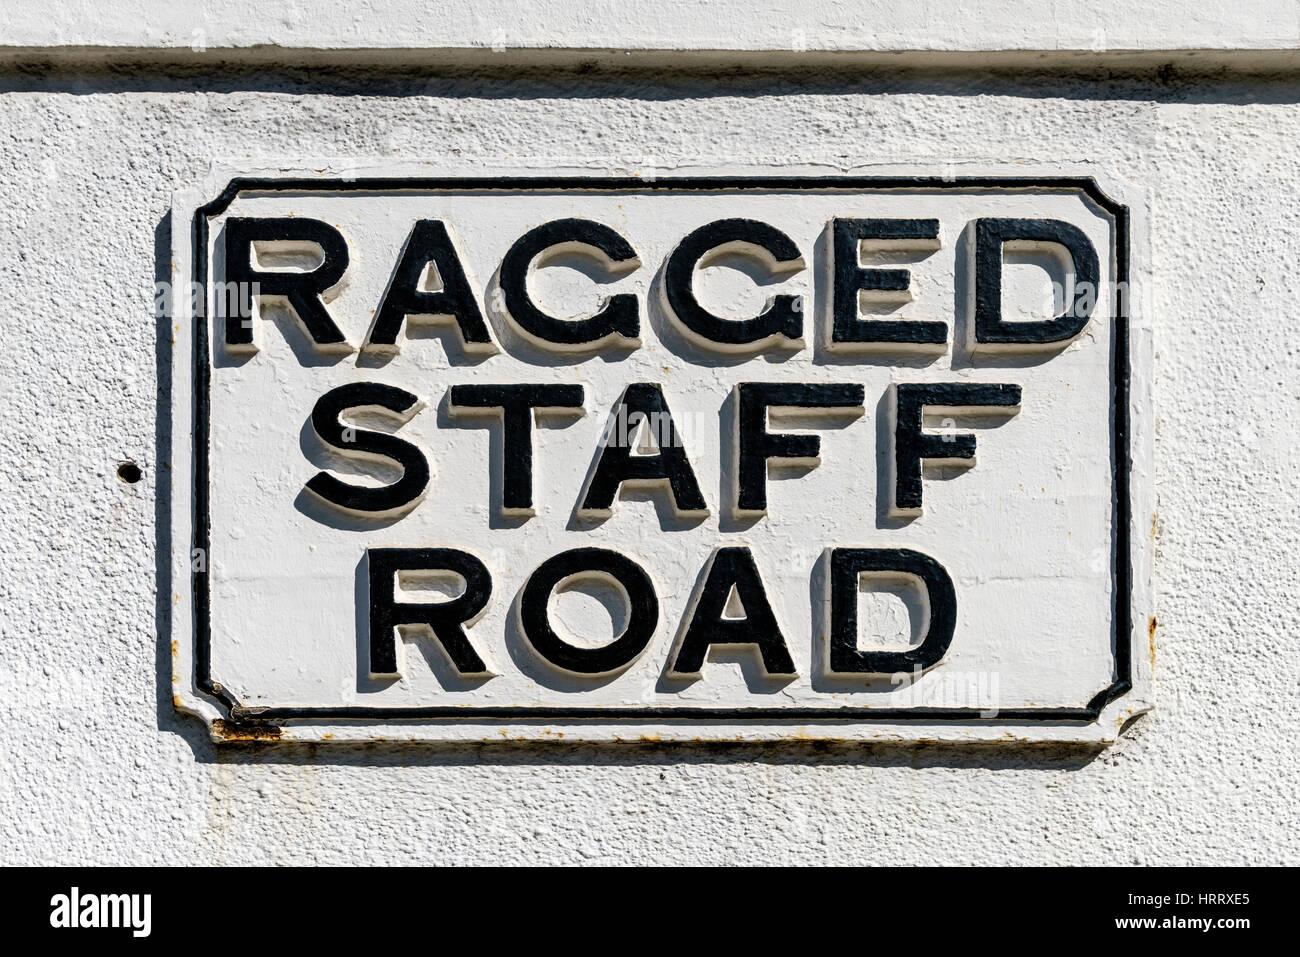 Ragged staff road - Stock Image